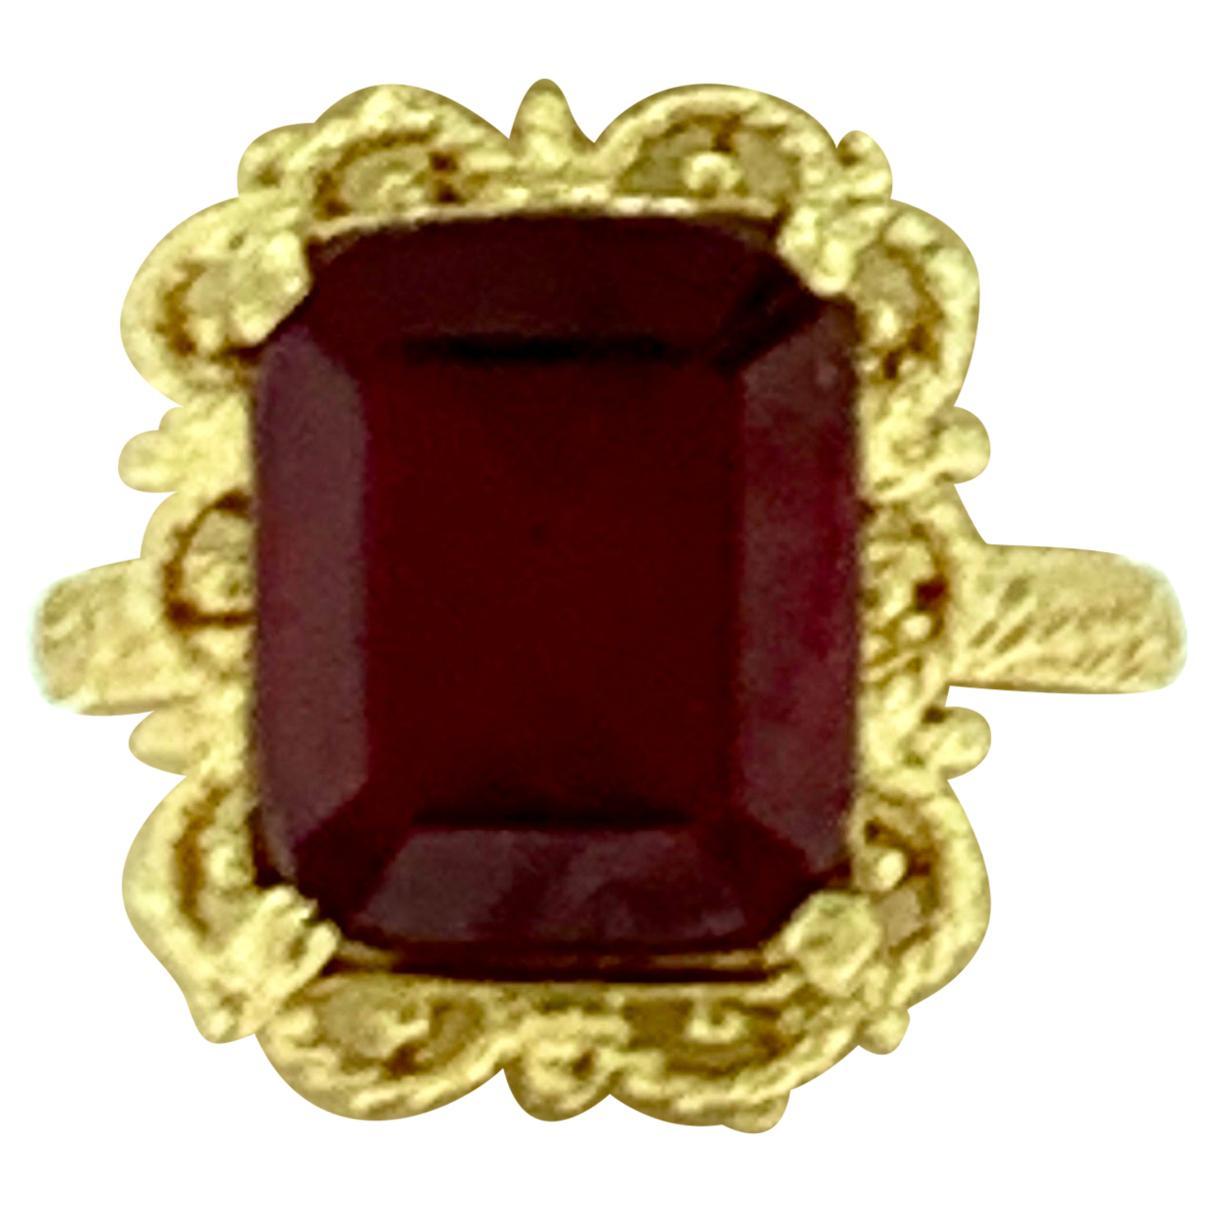 Emerald Cut 7 Carat Treated Ruby 18 Karat Yellow Gold Ring